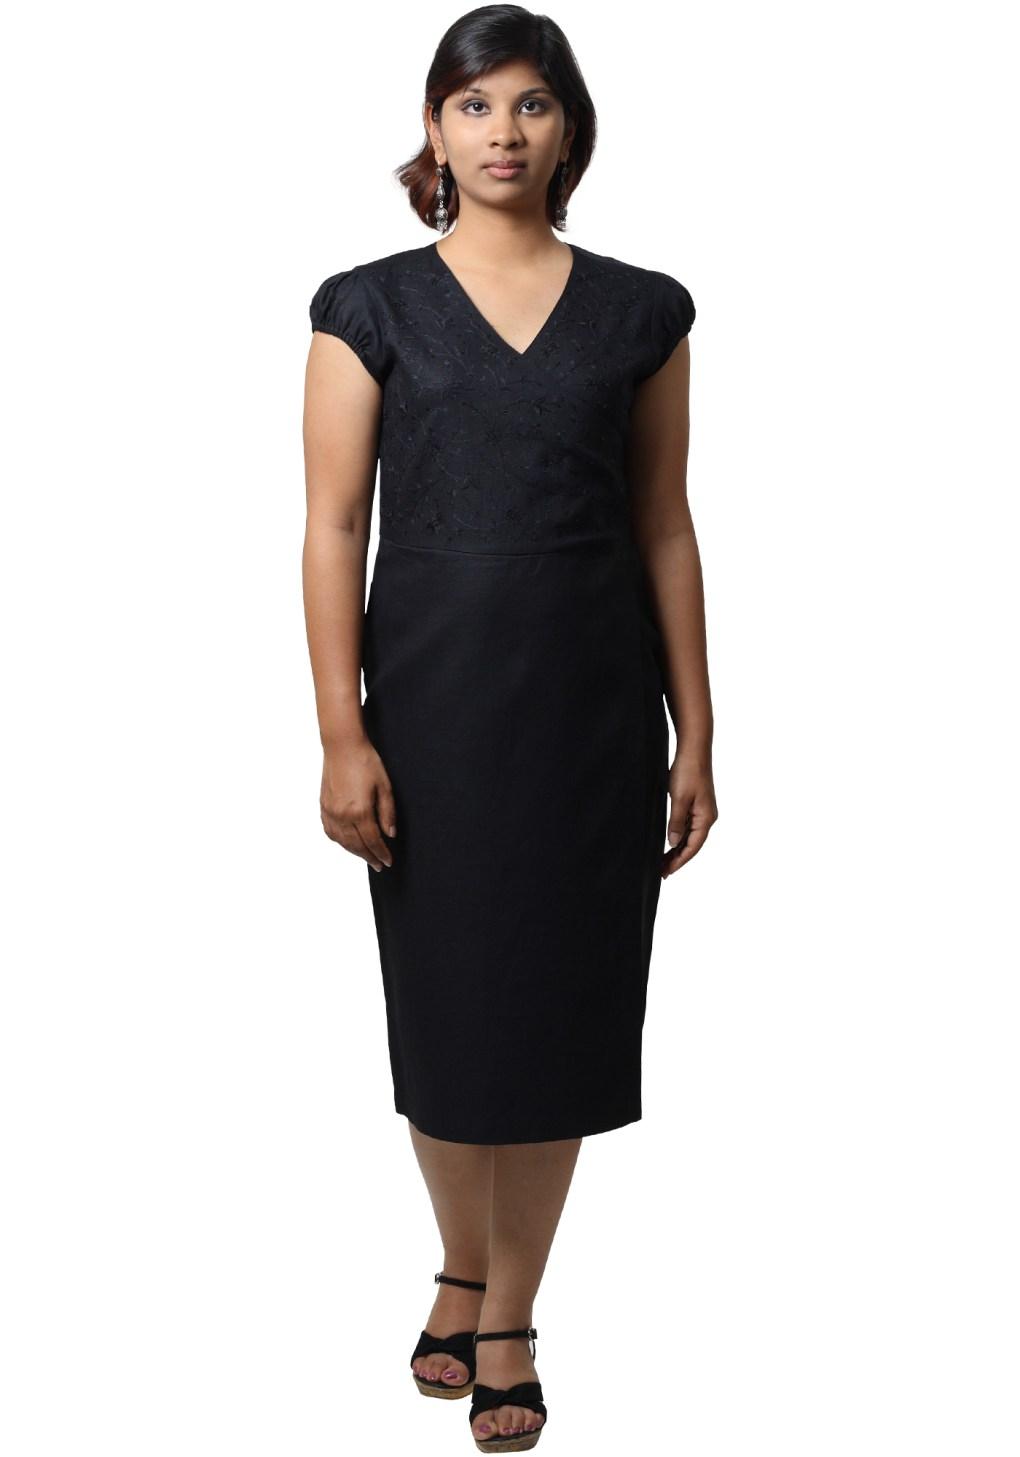 MINC Ecofashion Asymmetric Embroidered Little Black Linen Dress